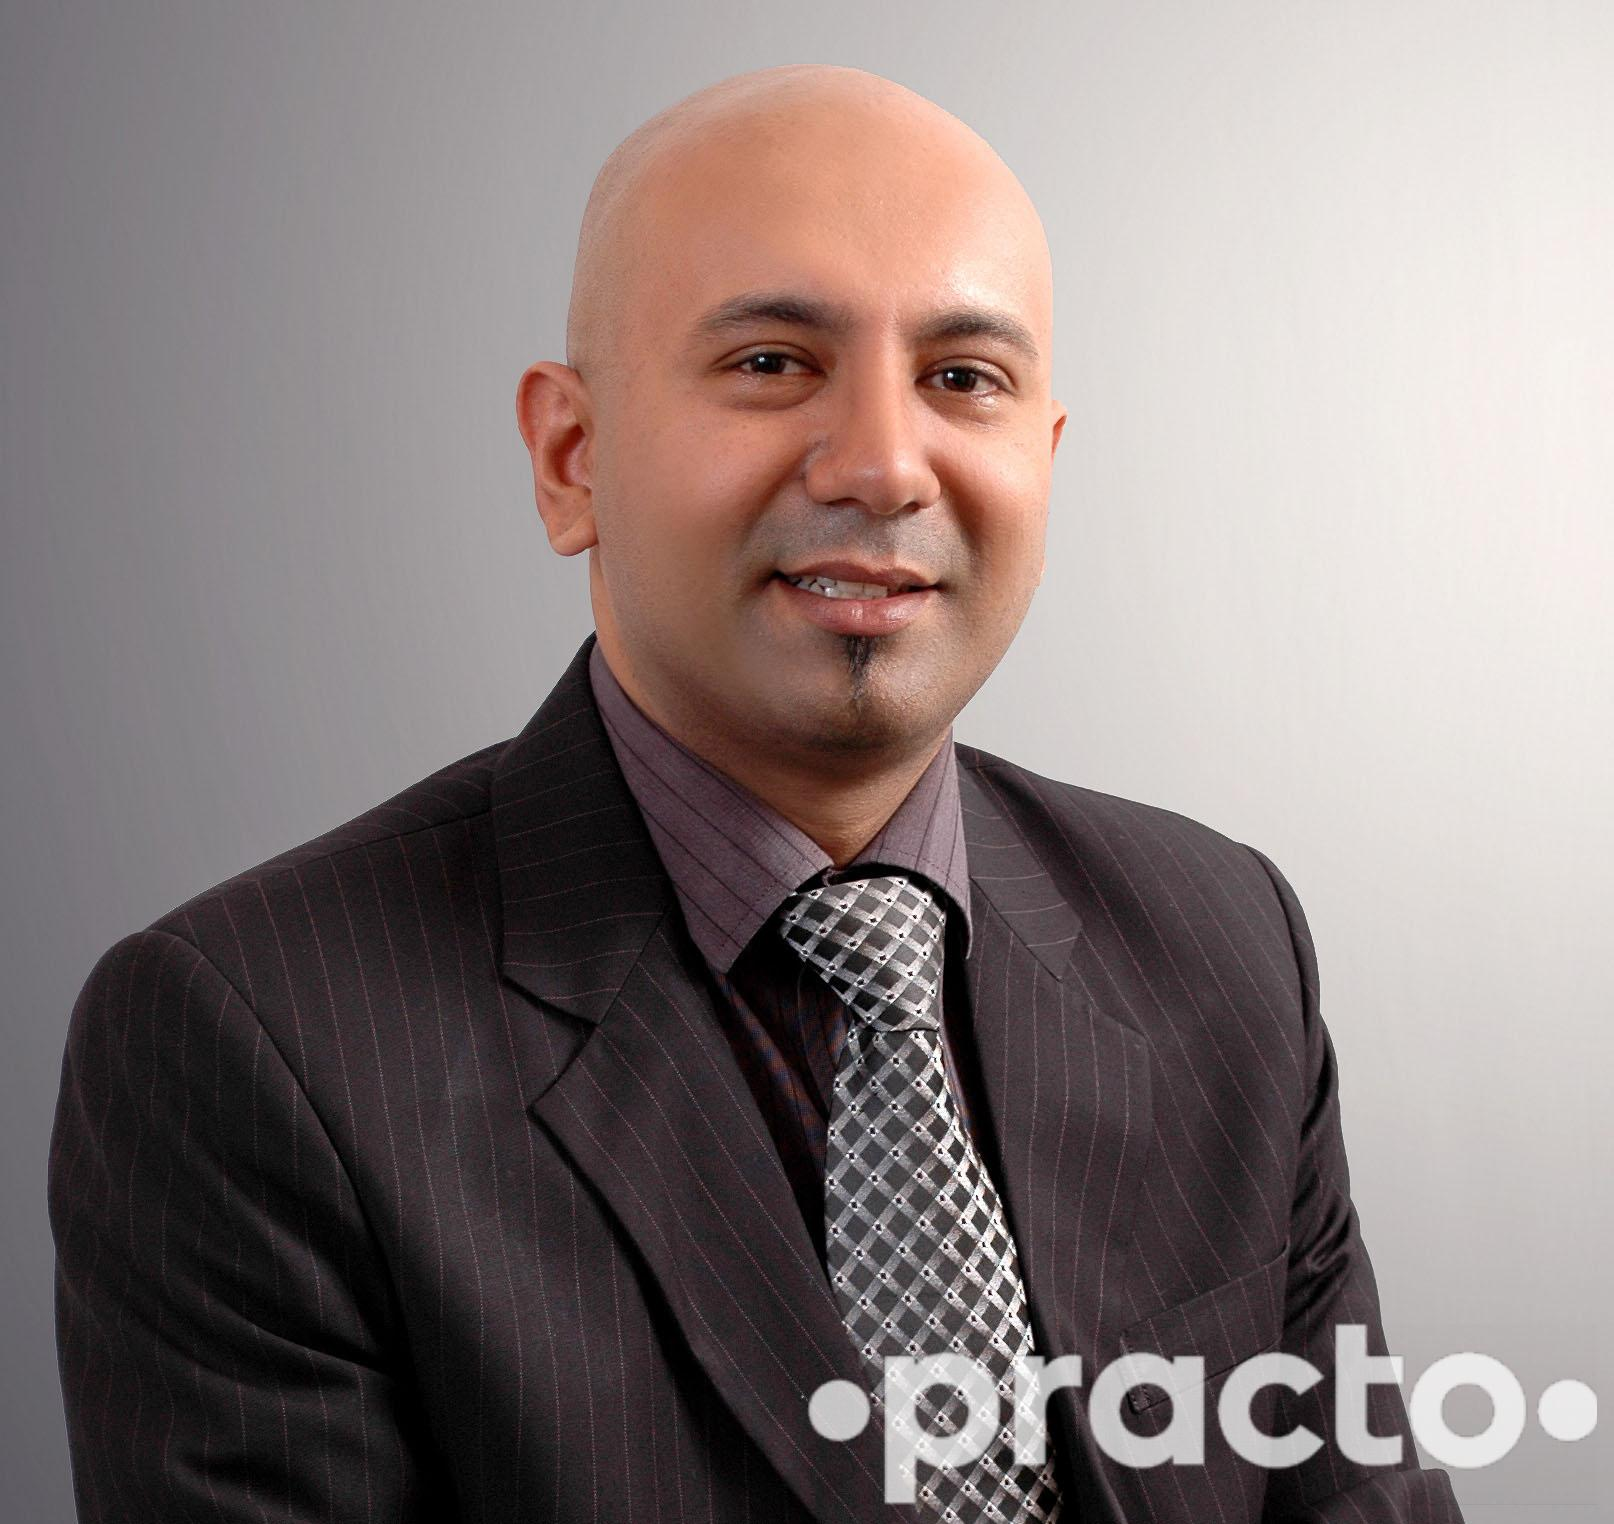 Dr. Rajesh Raveendranathan